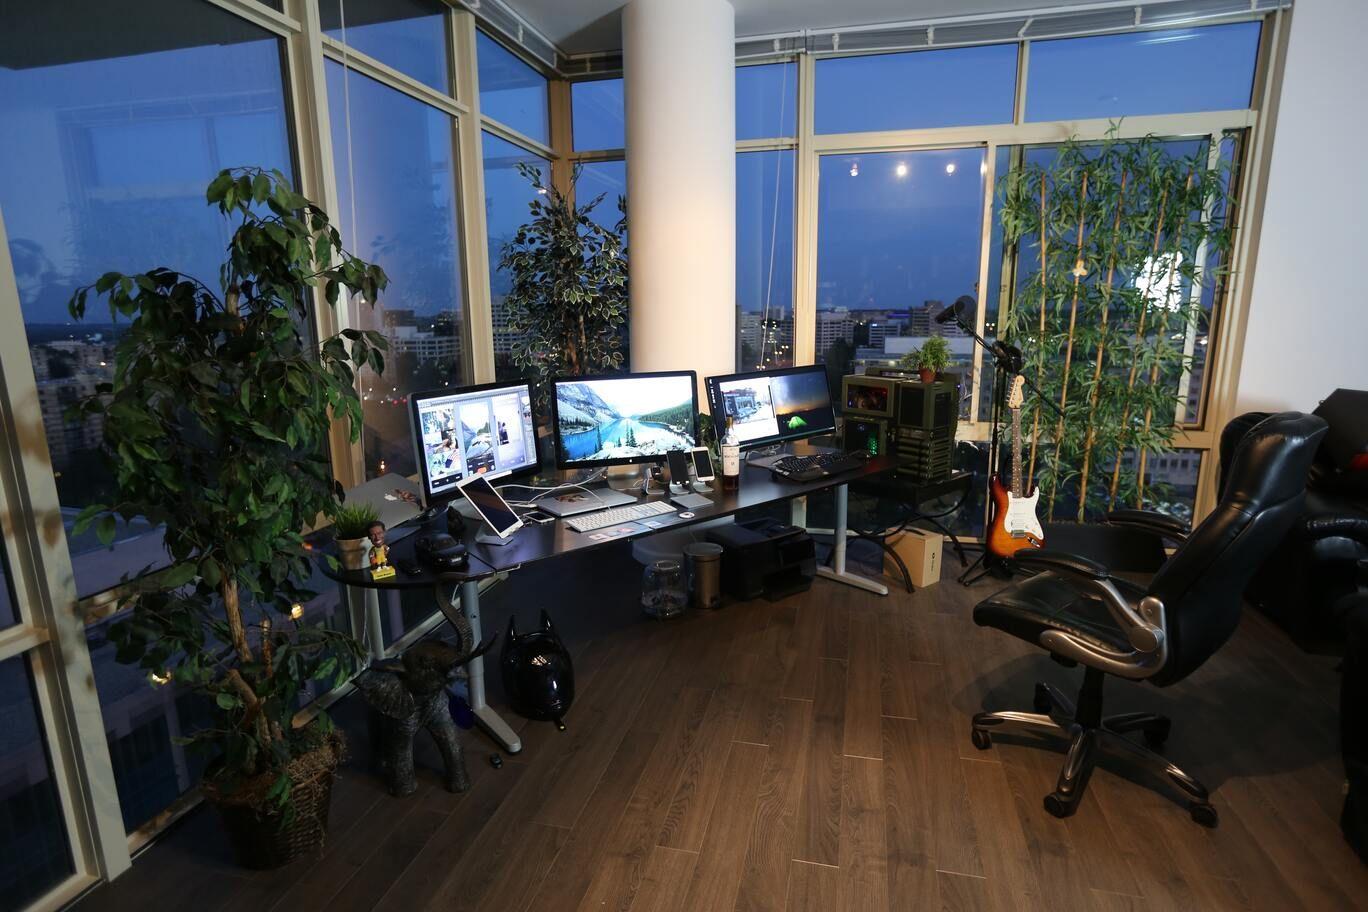 freelancer's ergonomic home office space